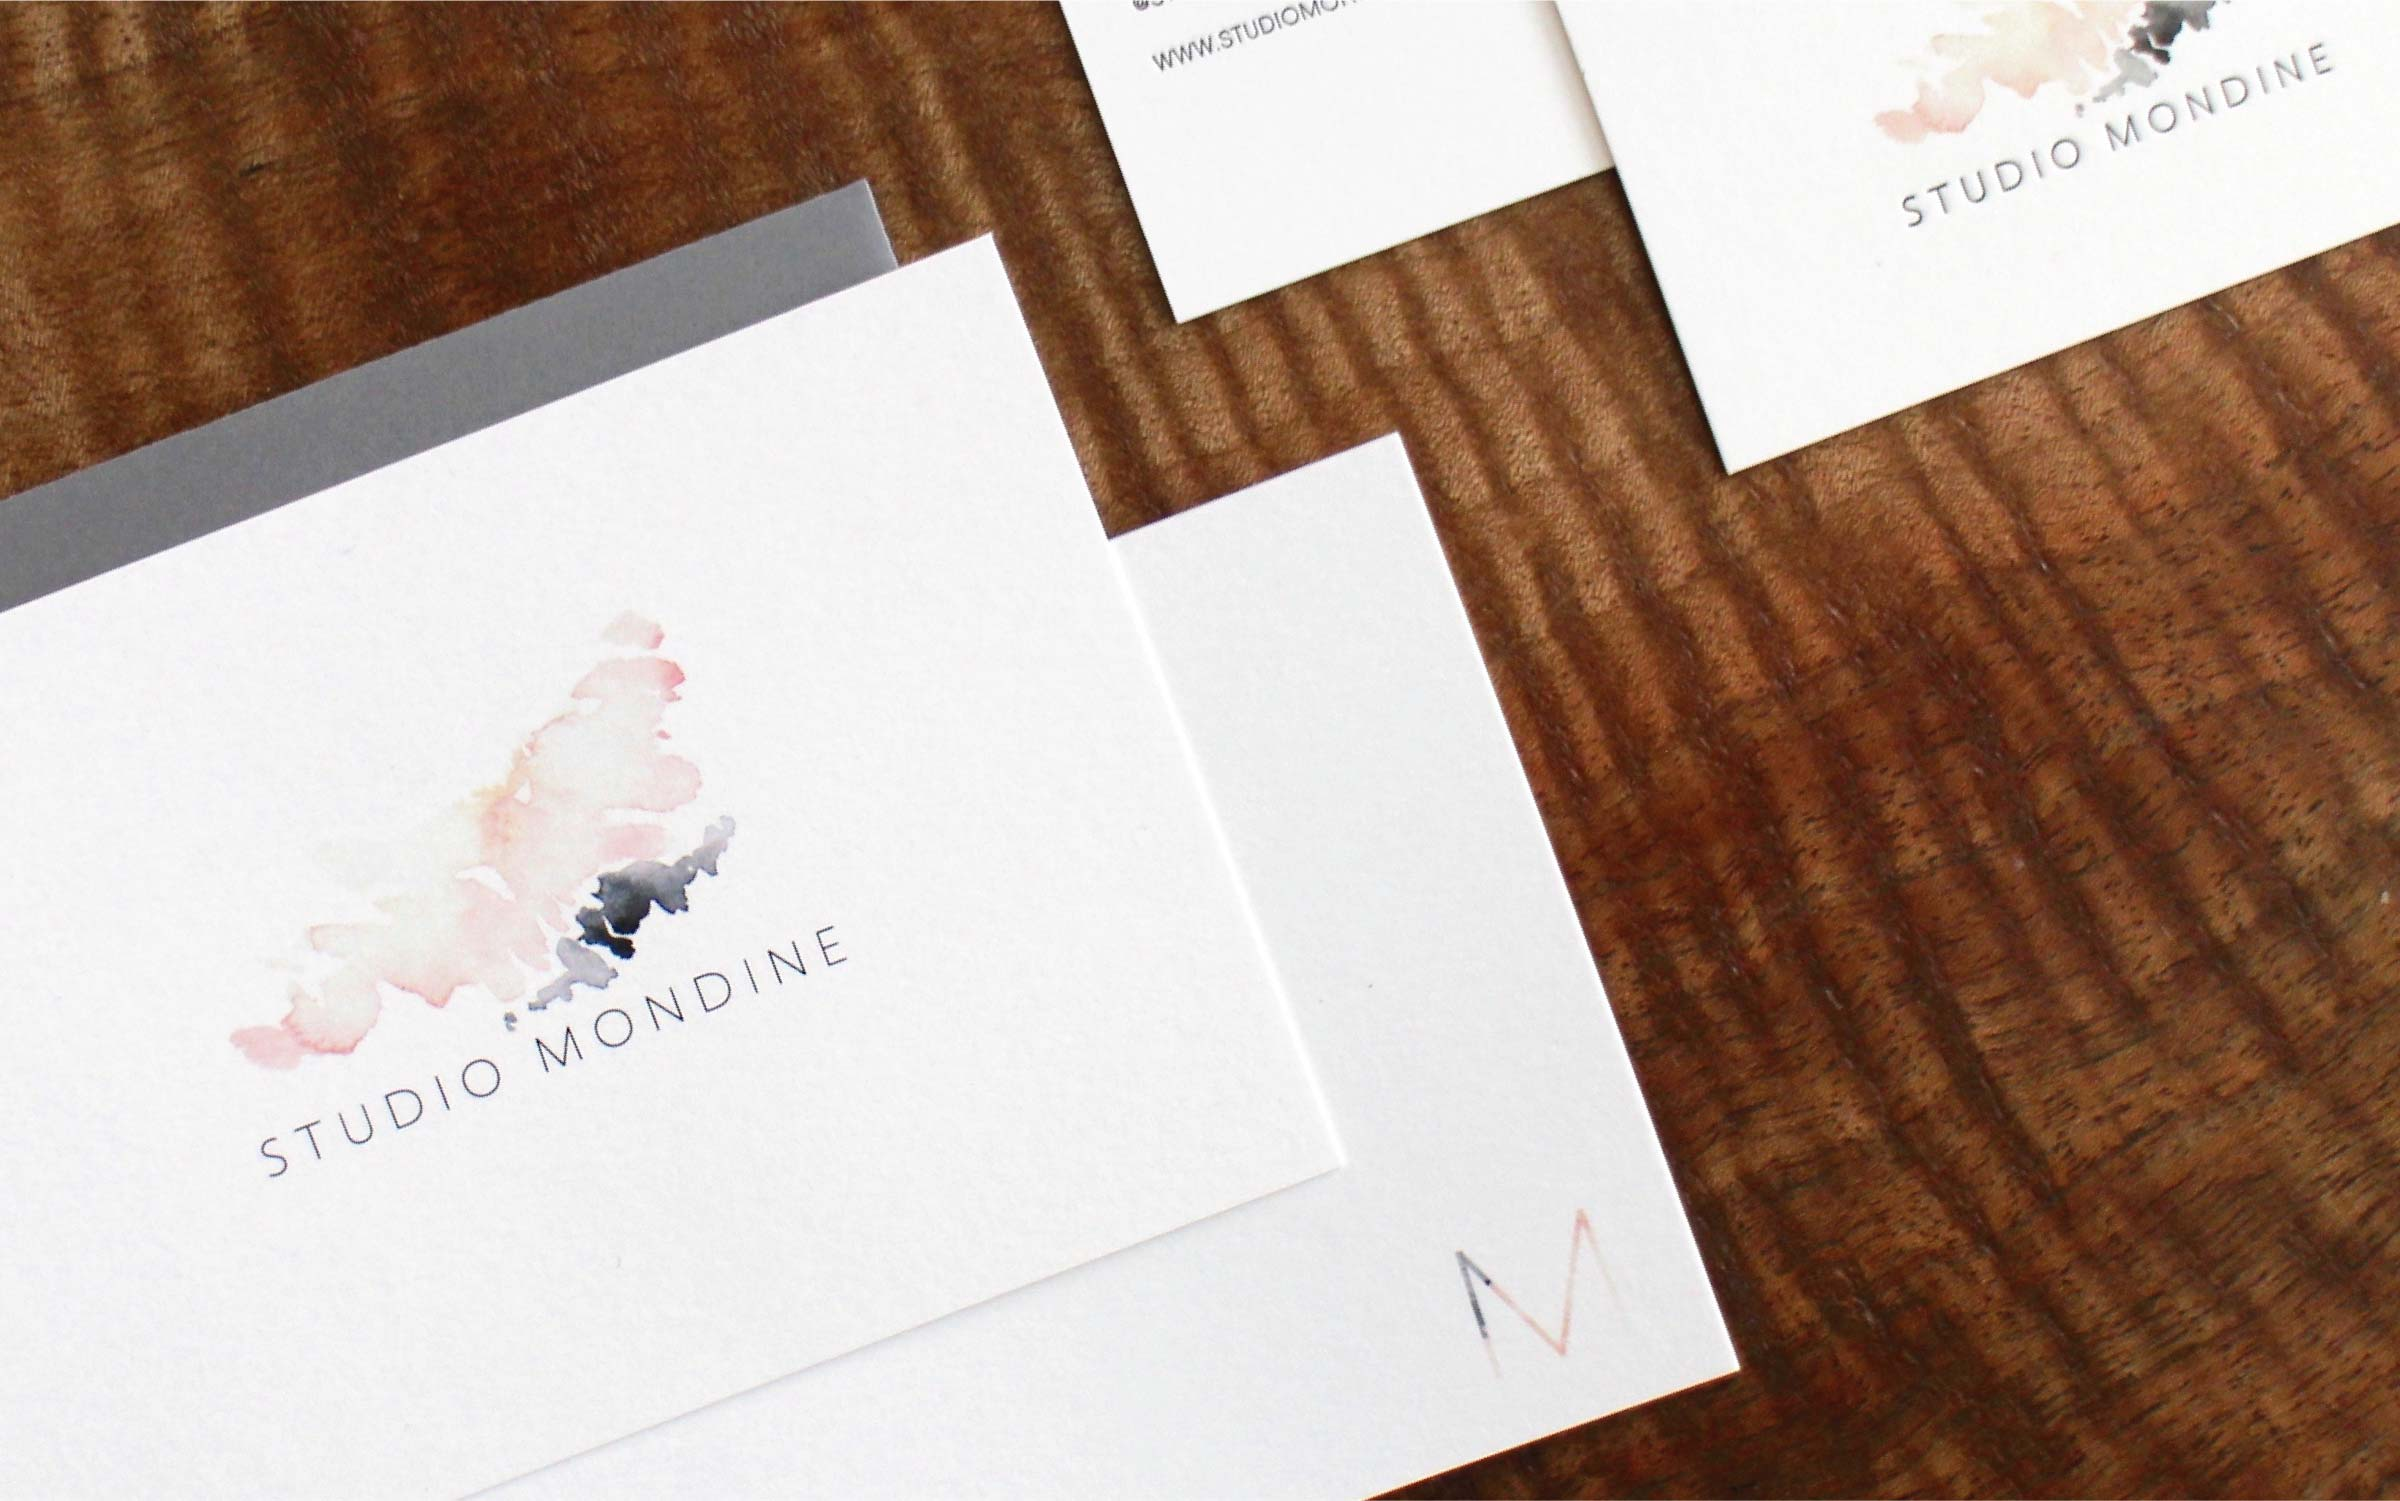 StudioMondine-Portfolio-2019-05.jpg